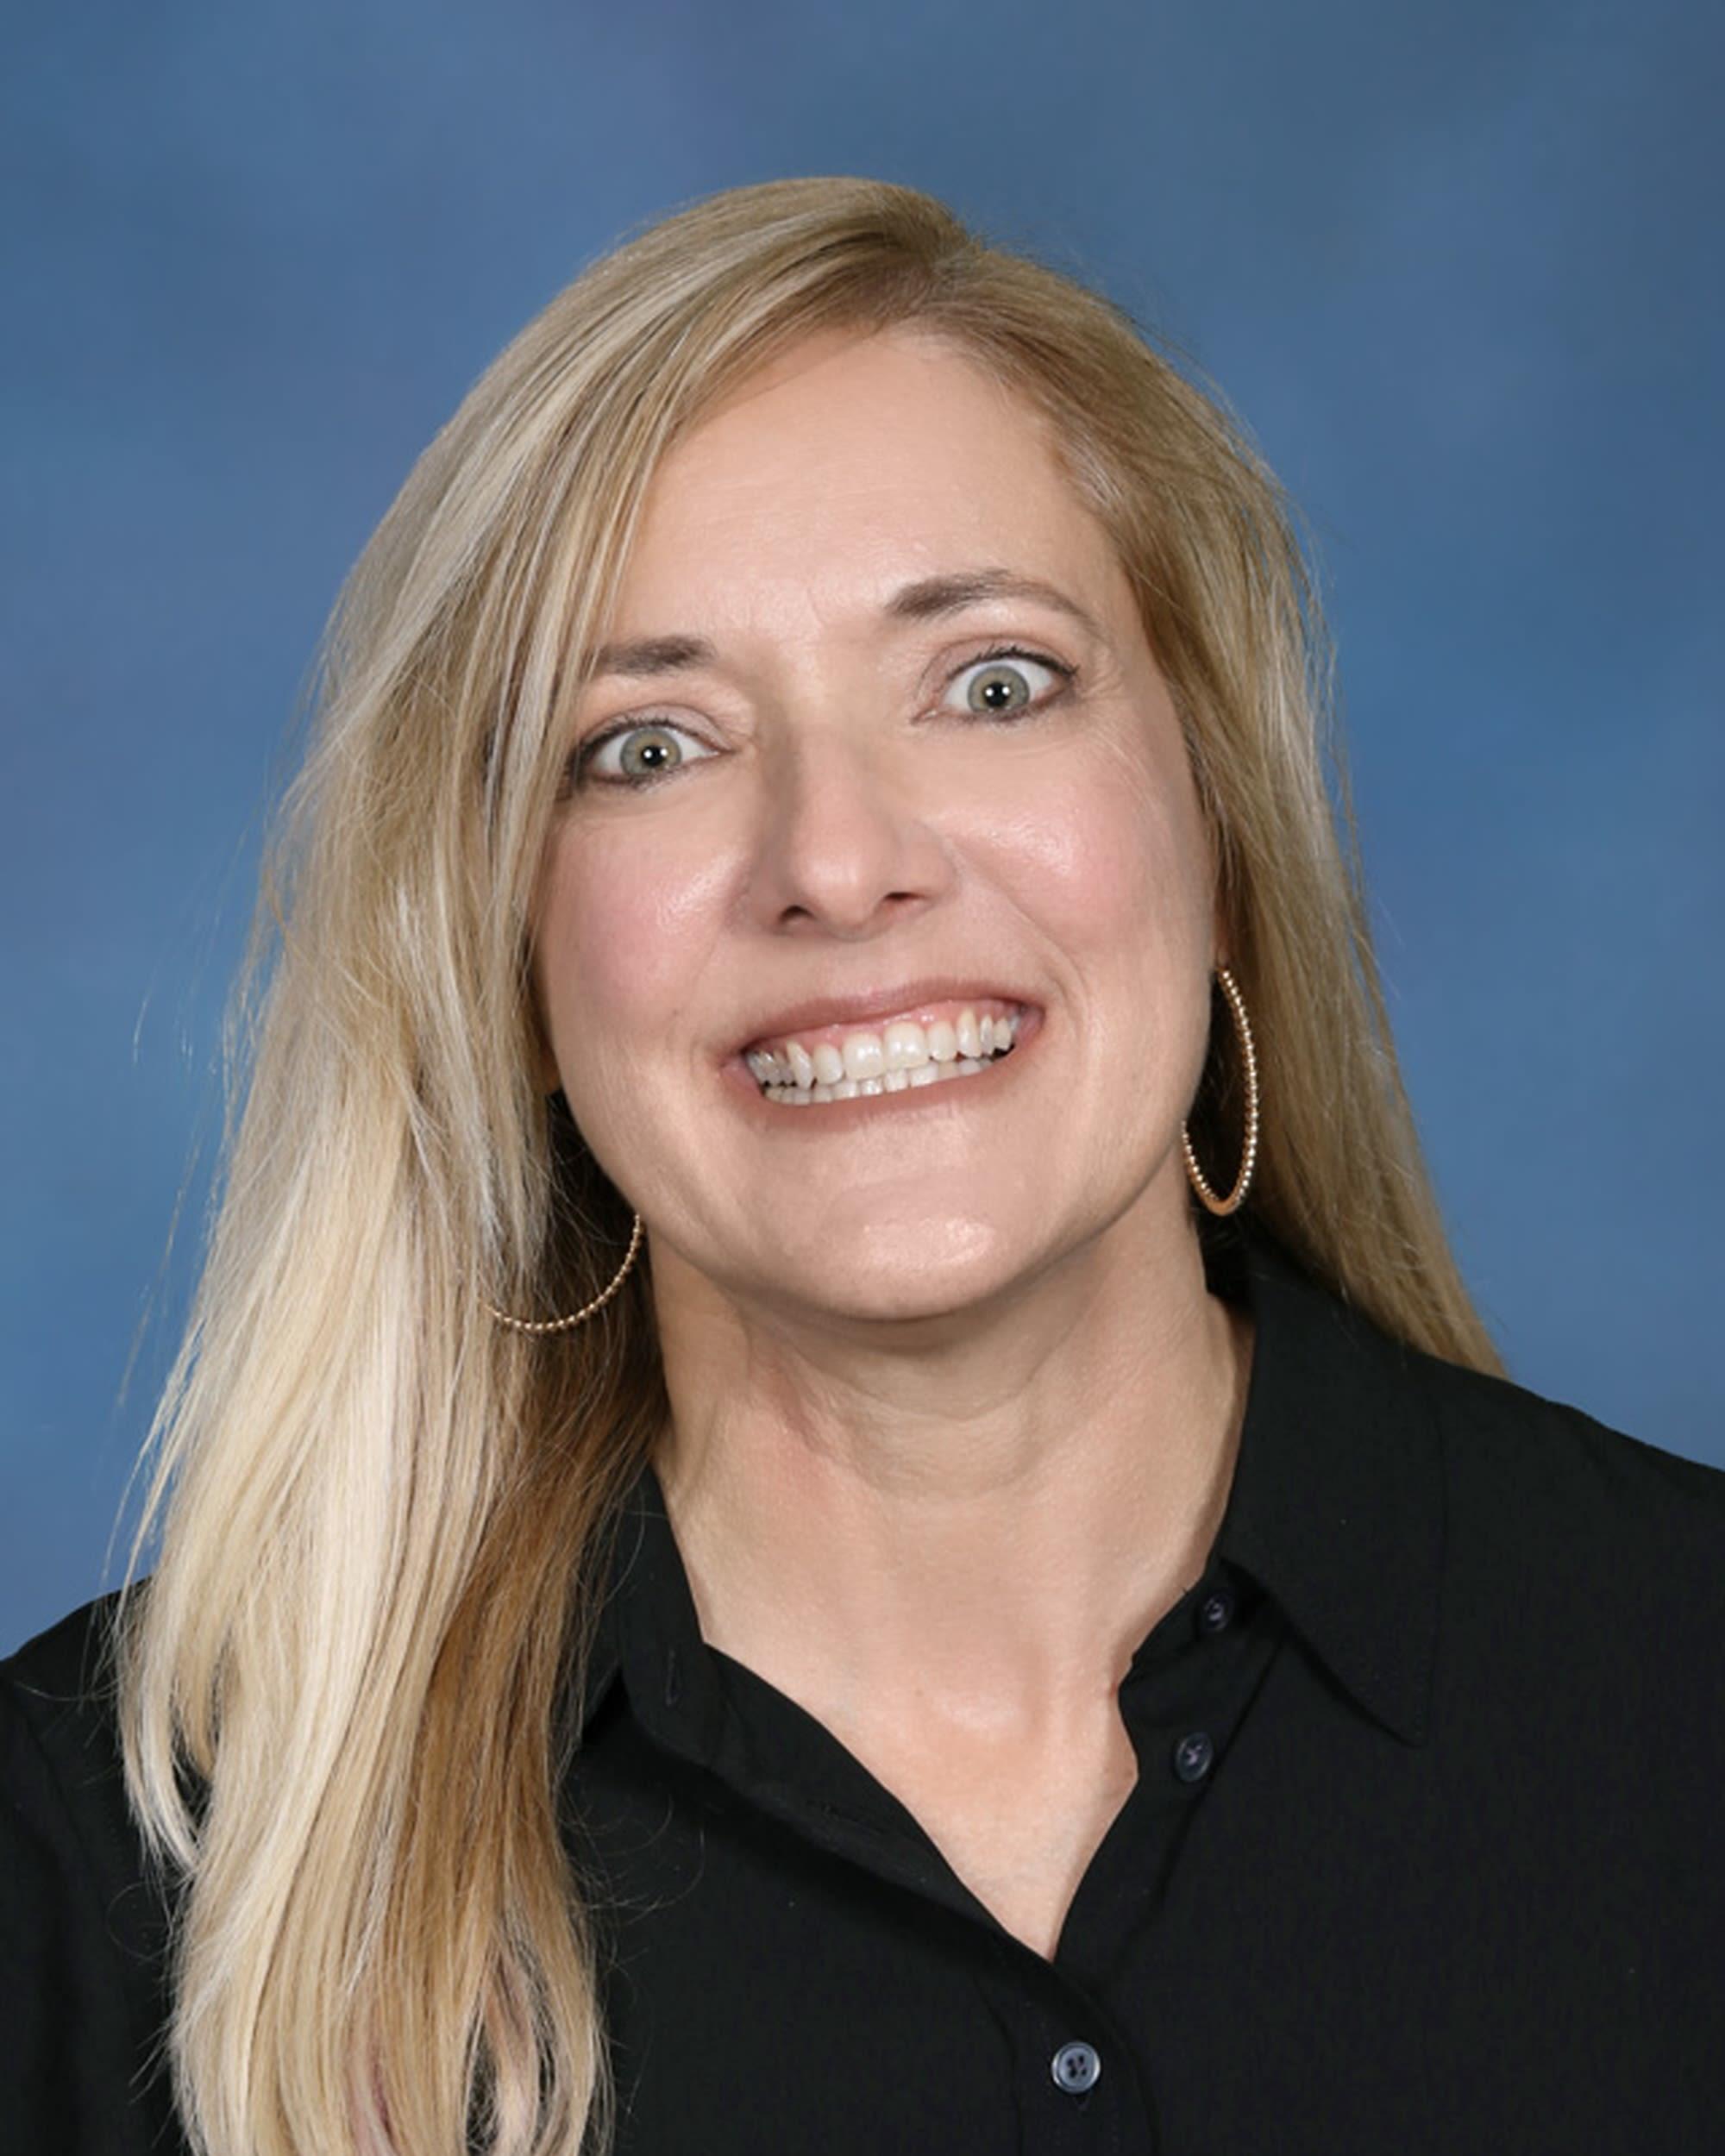 Christine Bell - Chets Creek Elementary